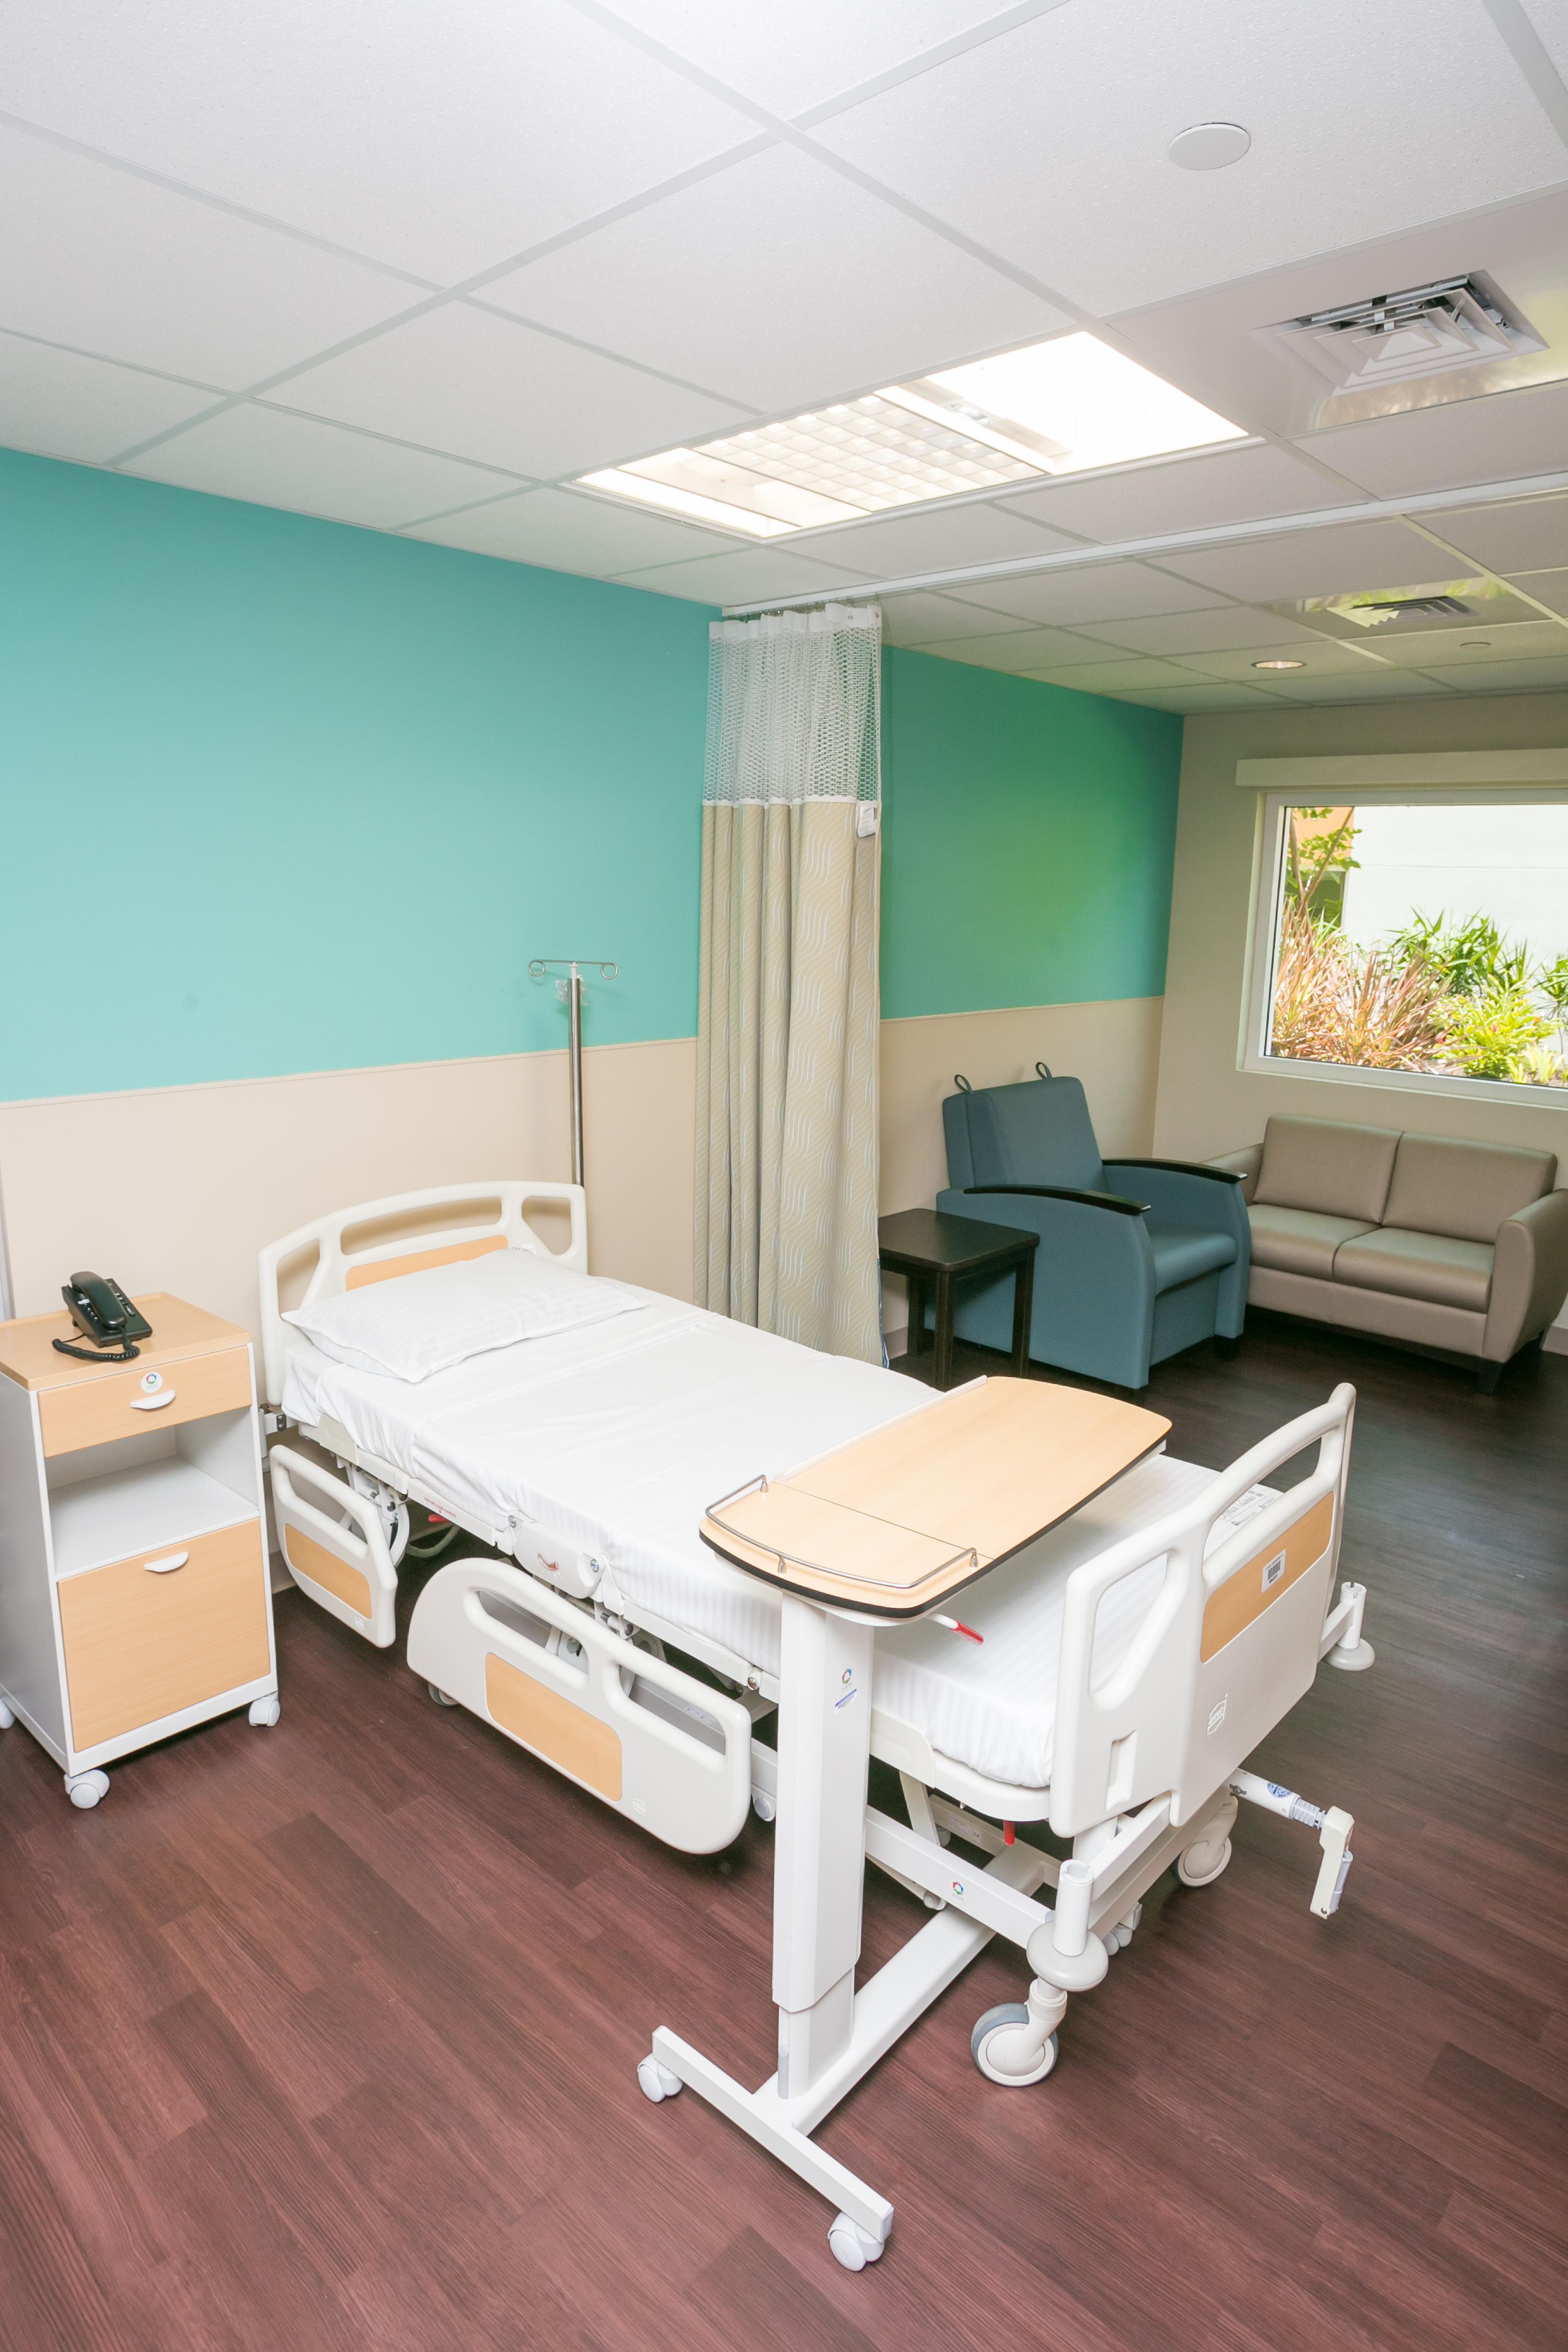 Descriptive Paragraph about a Hospital Emergency Room